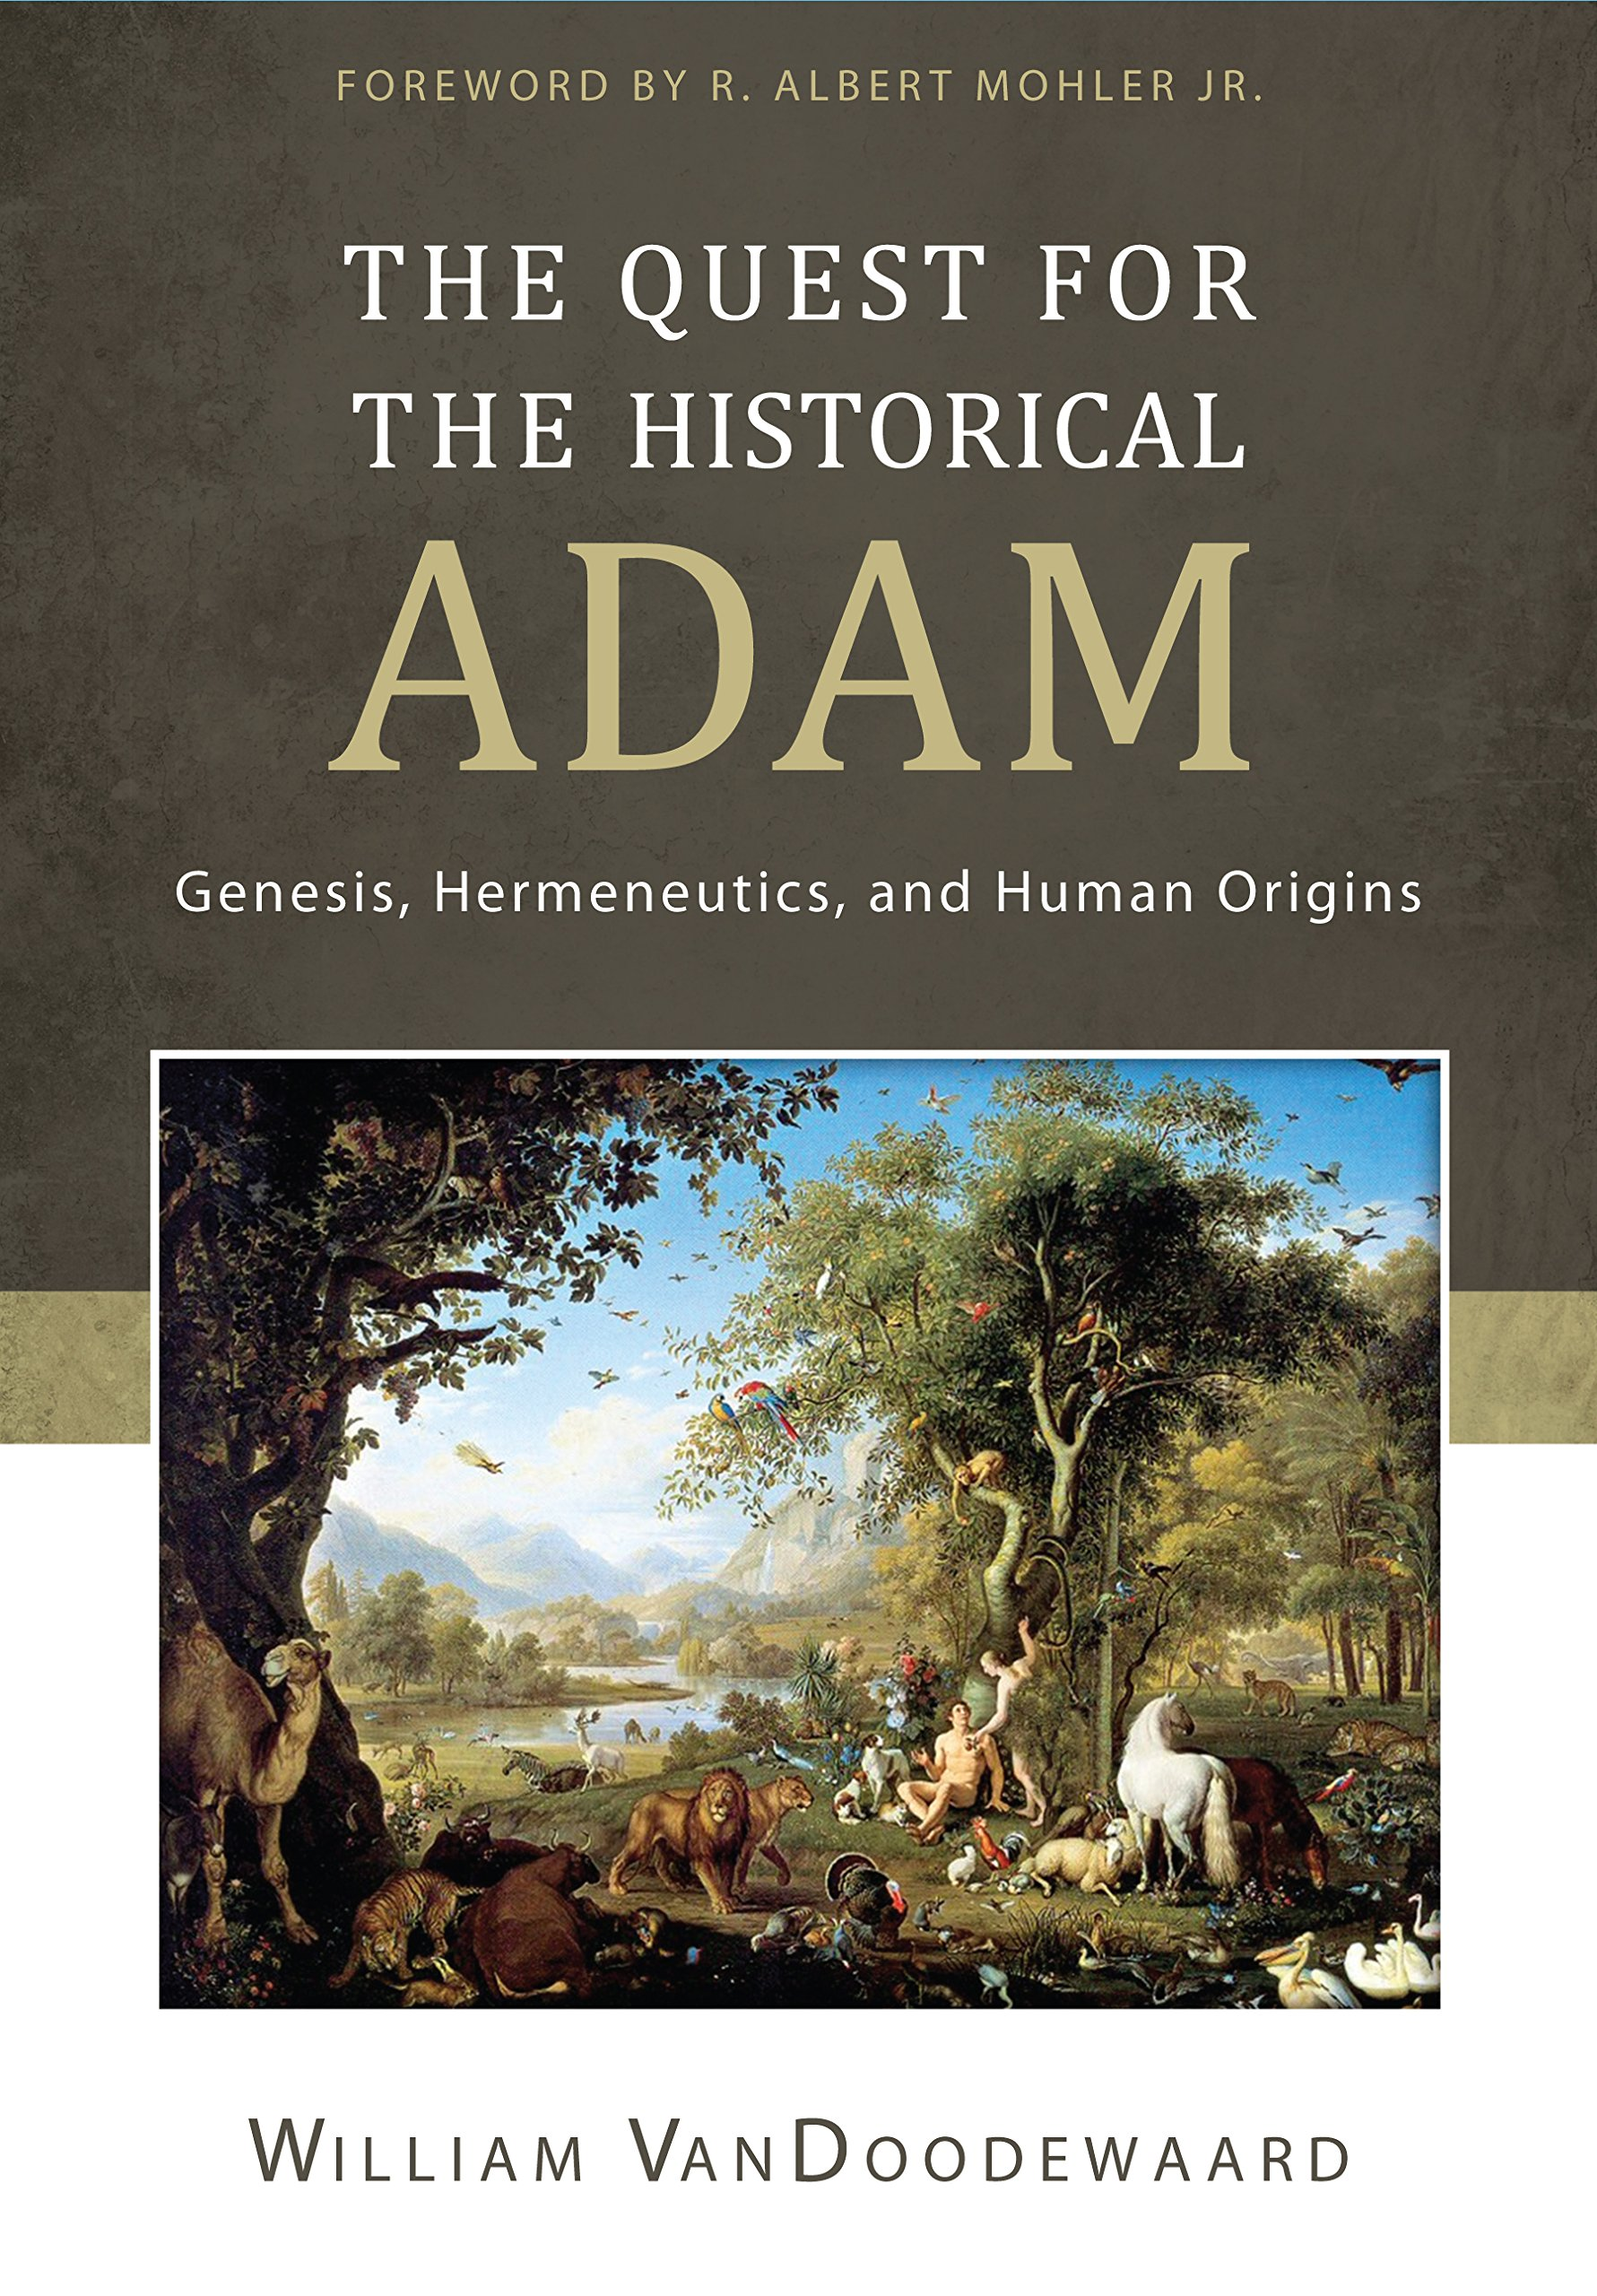 The Quest for the Historical Adam: Genesis, Hermeneutics, and Human Origins pdf